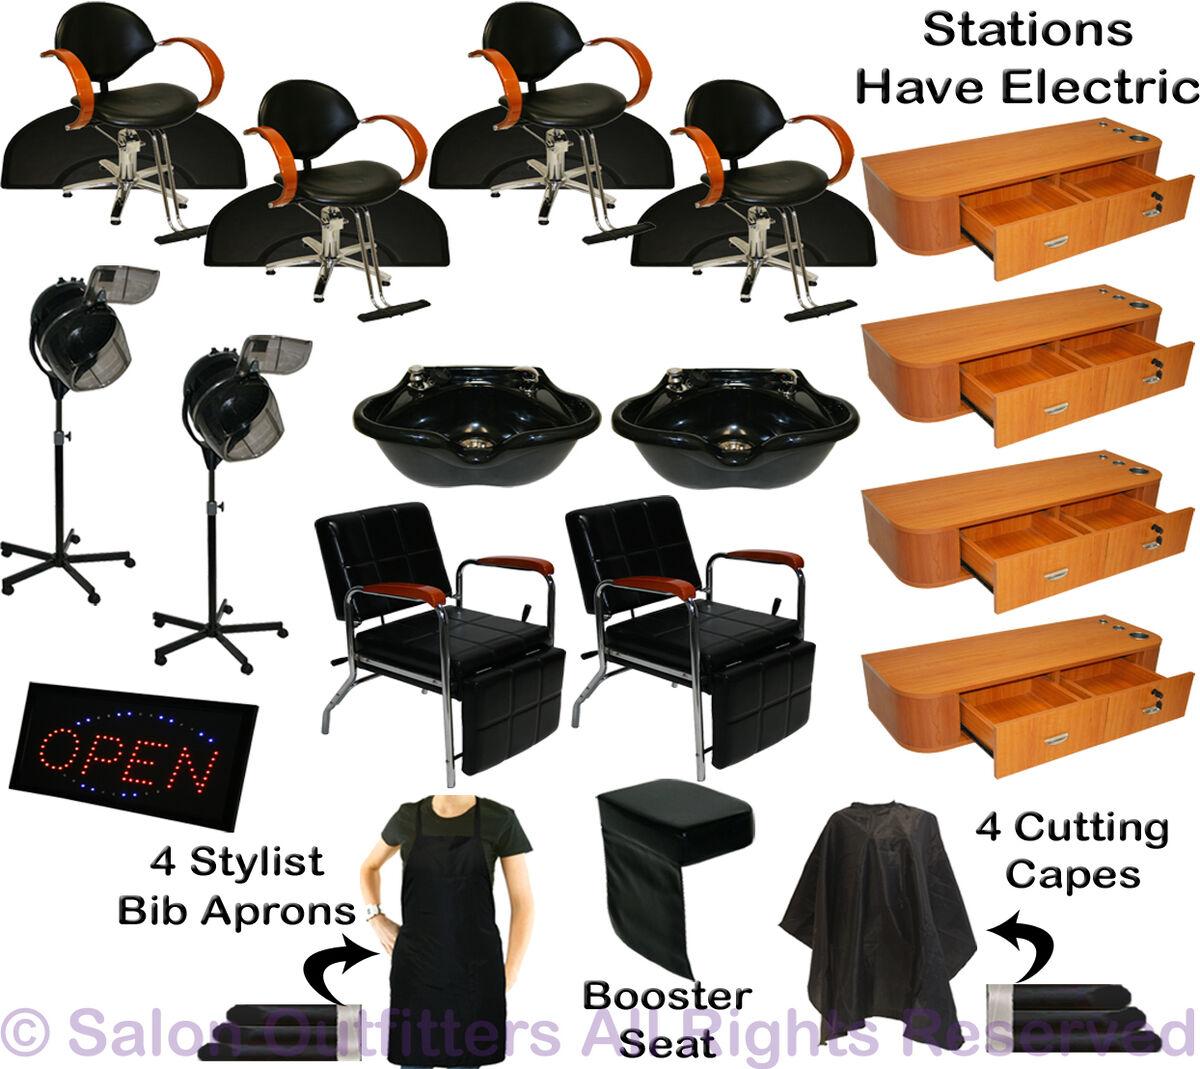 Hydraulic Barber Chair Station Shampoo Bowl Hair Dryer Beauty Salon Equipment